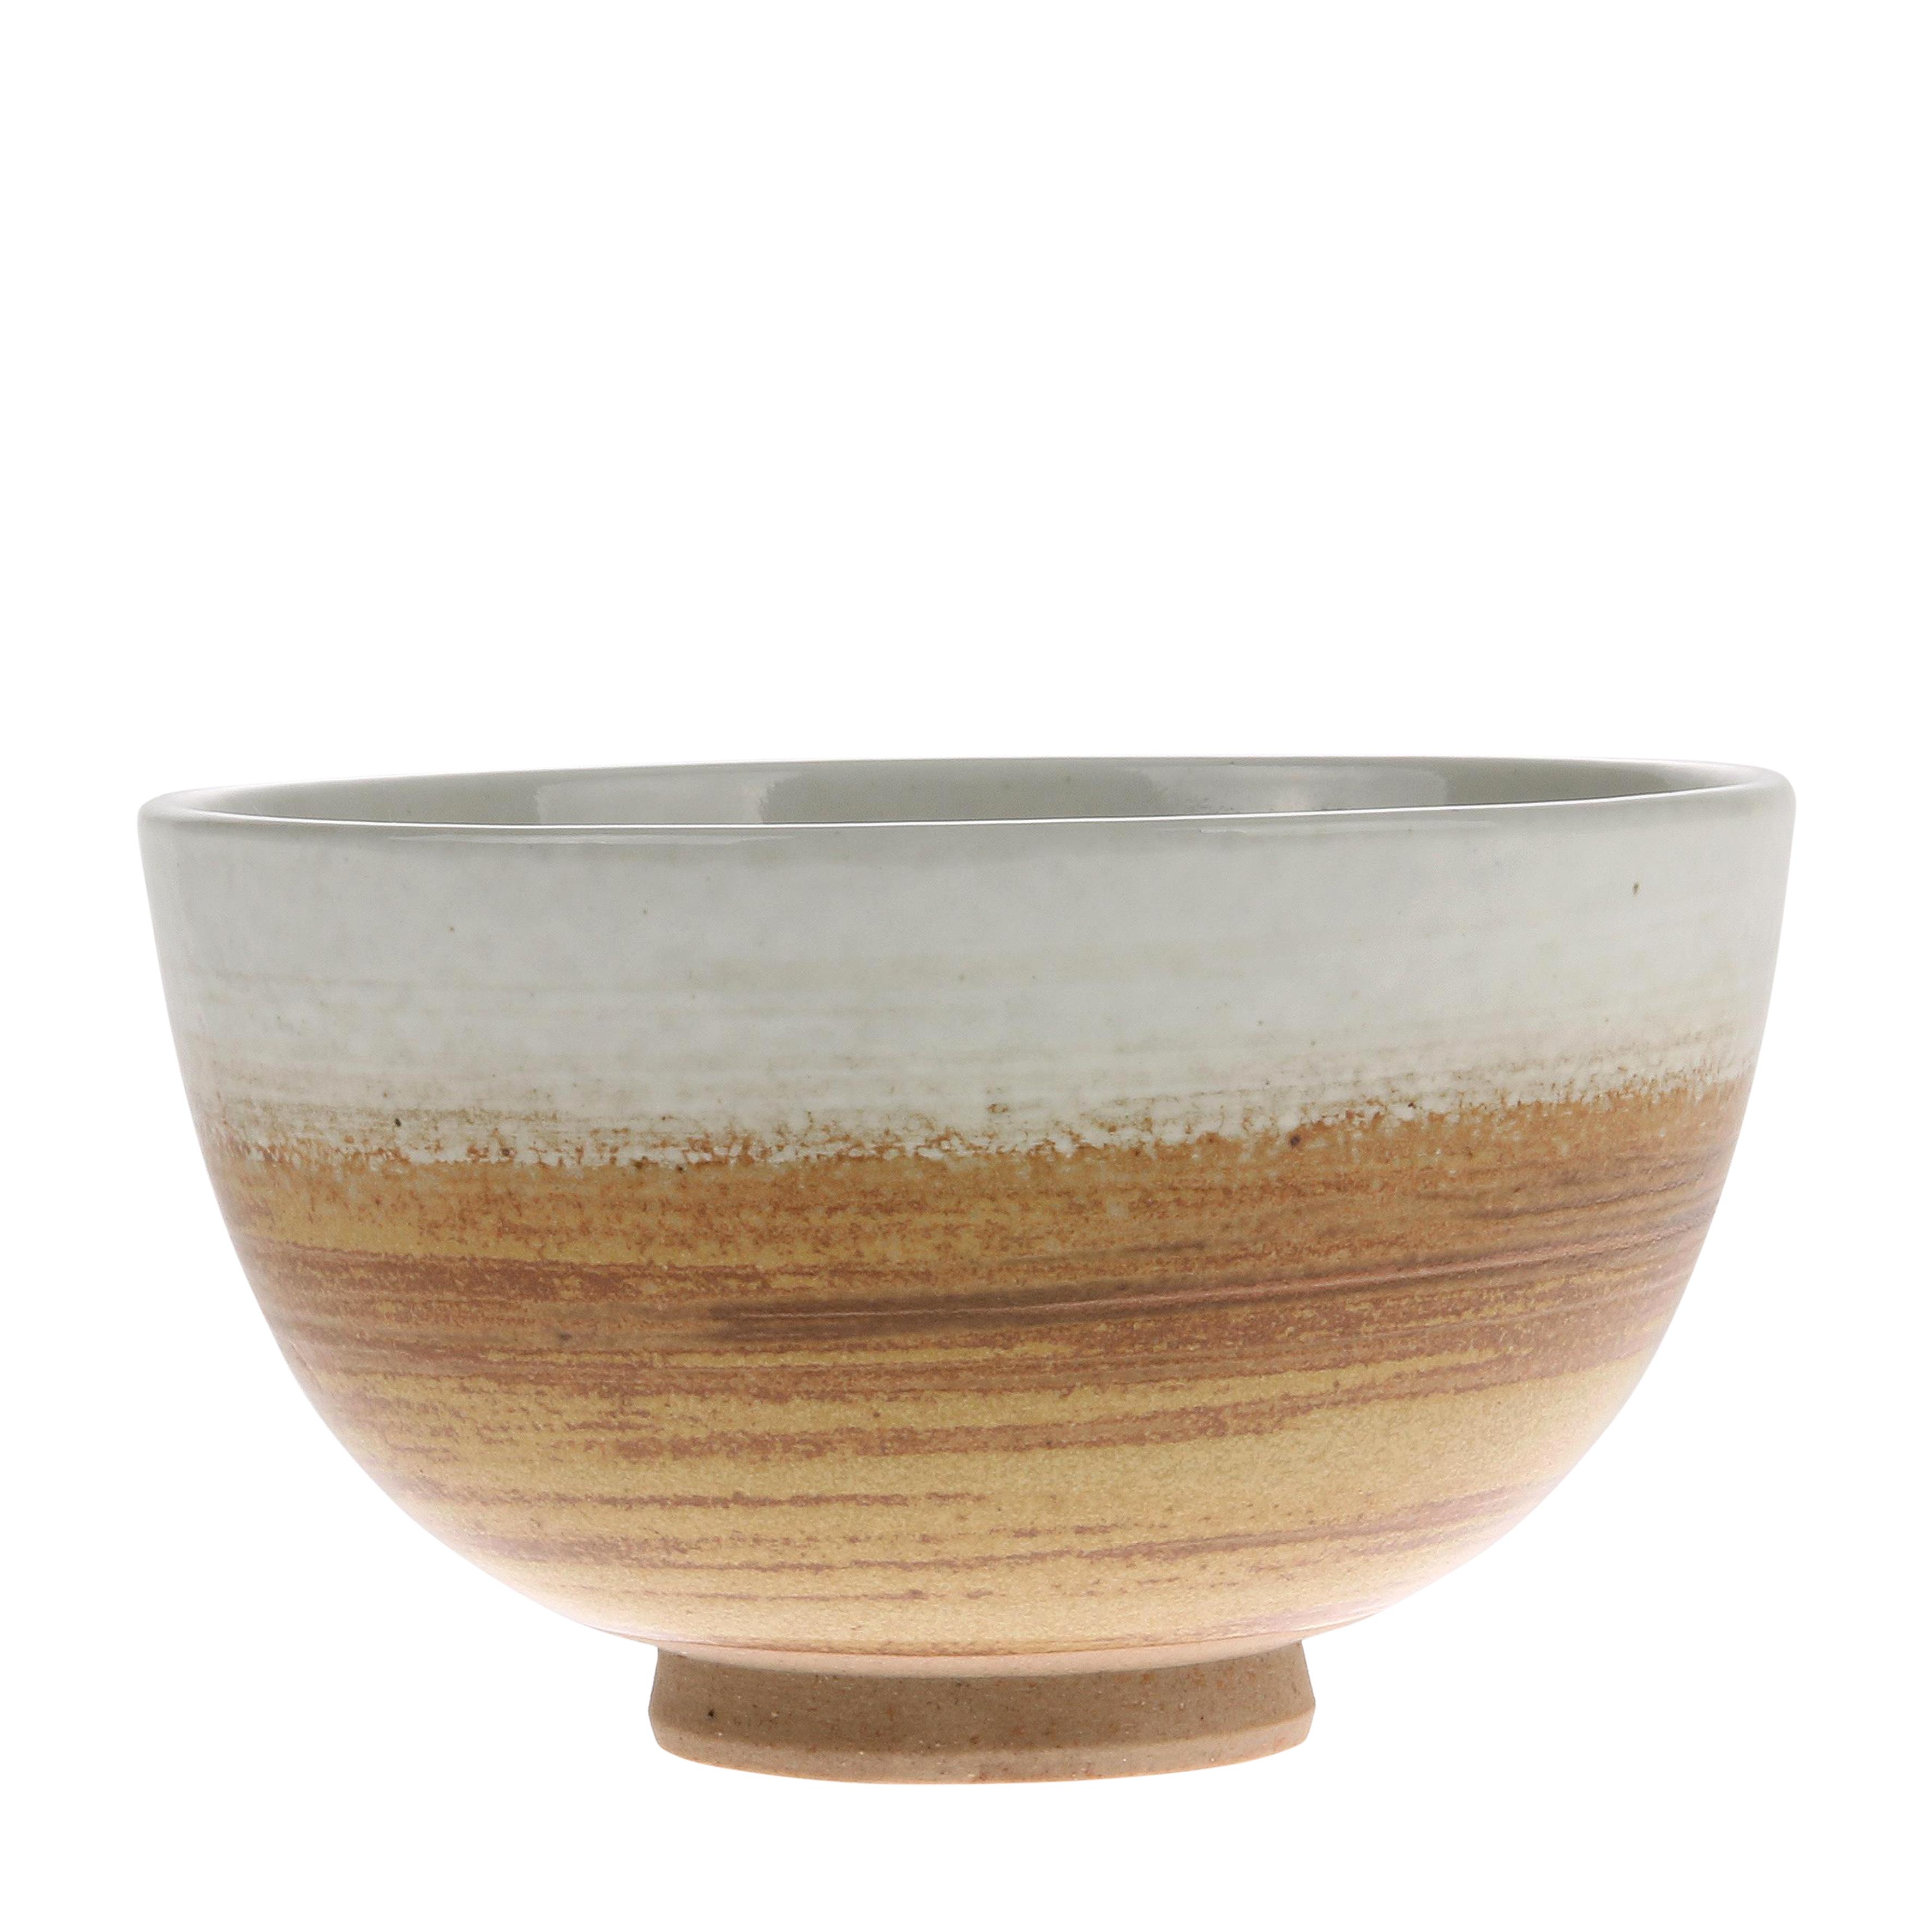 HK Living Kyoto Ceramics Schale braun/ weiß